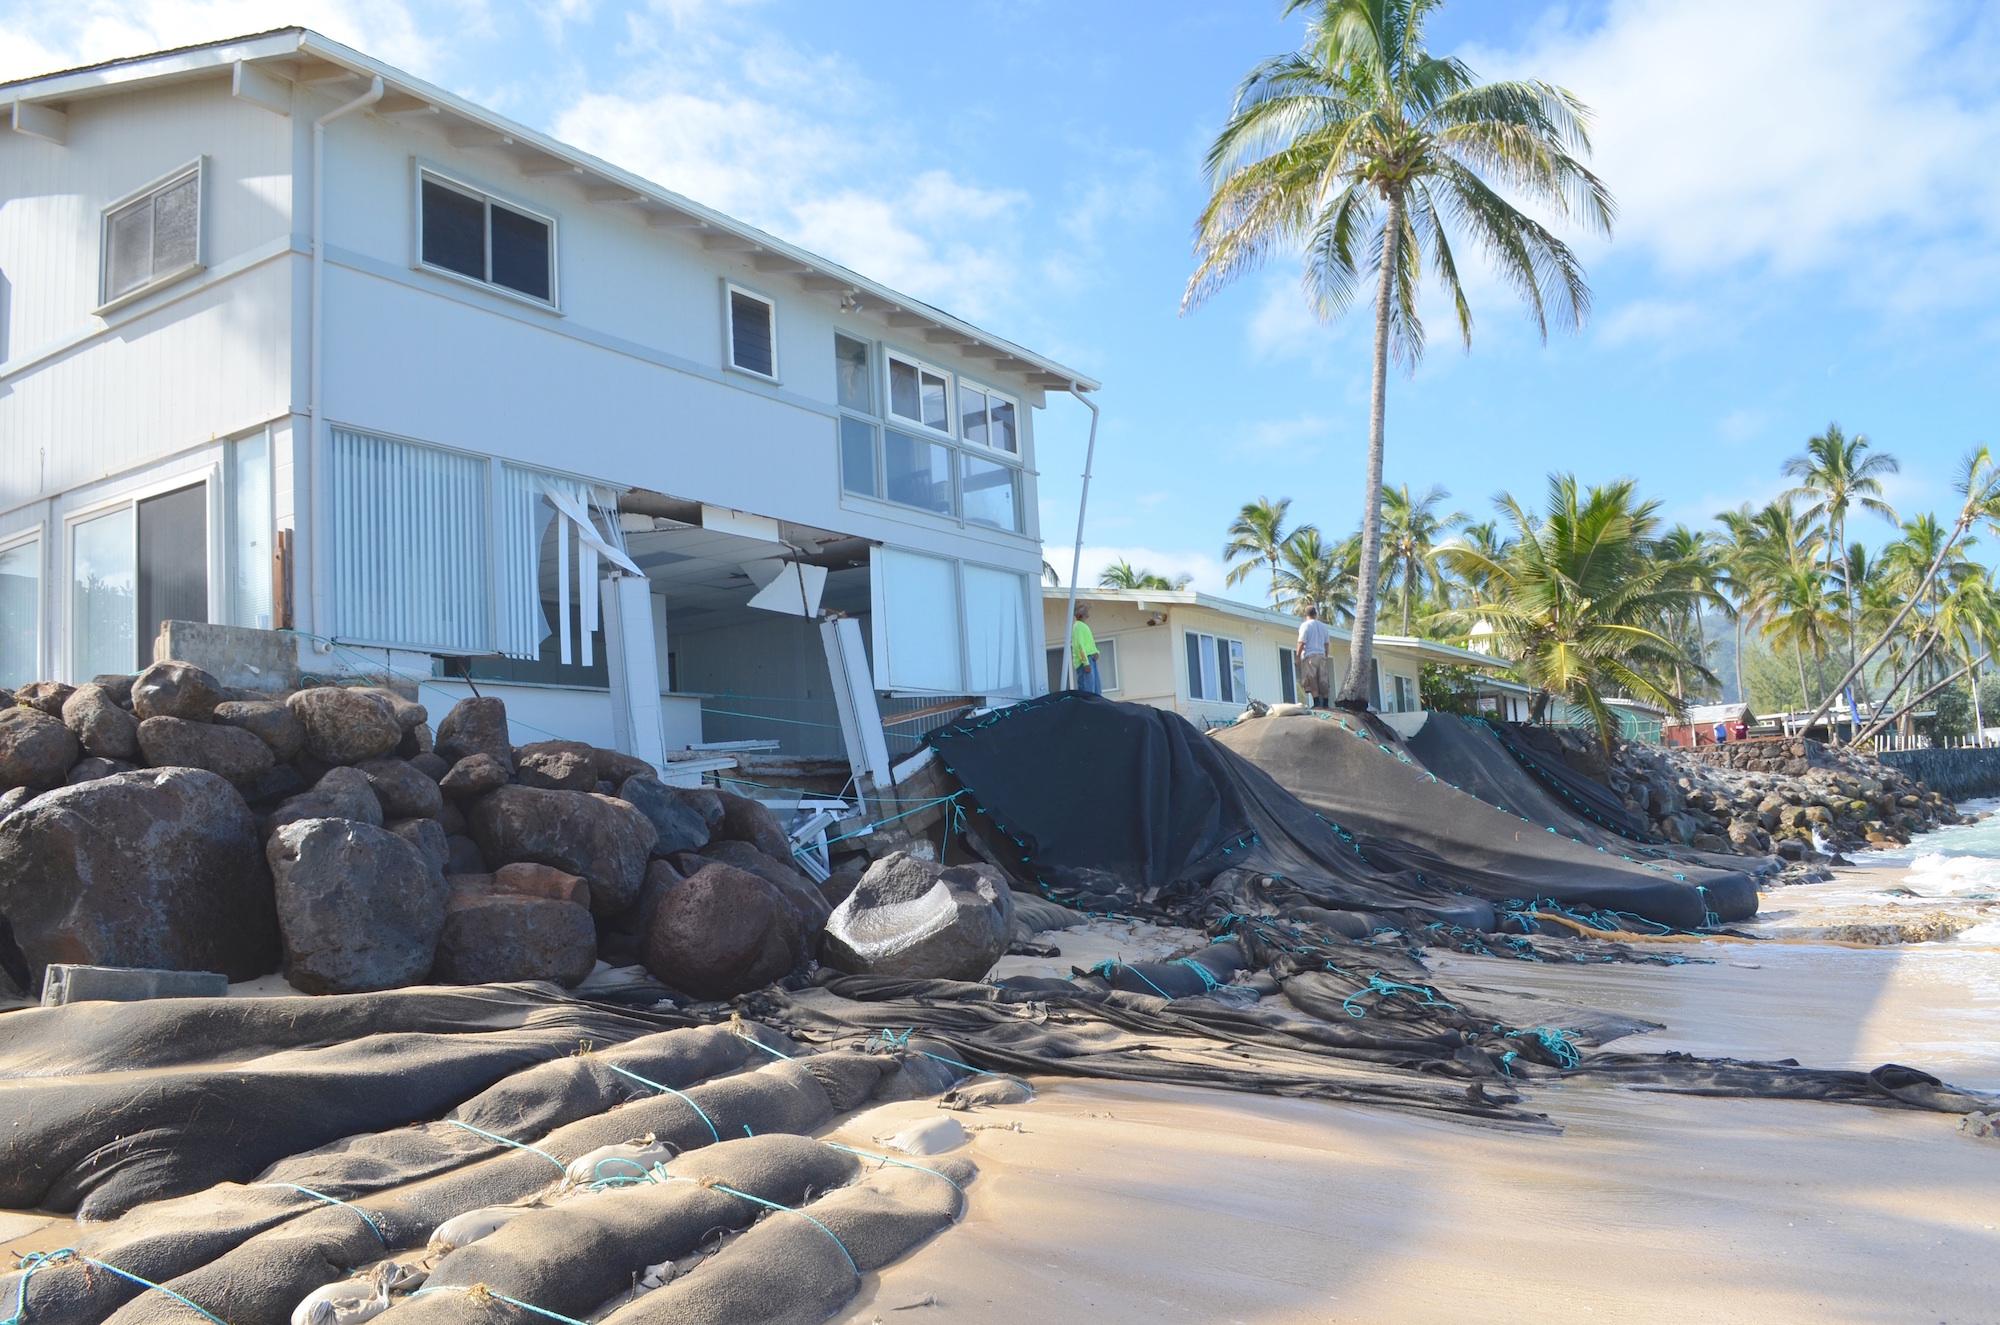 Extensive shoreline erosion near homes at Mokuleia on Oahu's northshore. Credit: Brad Romine.